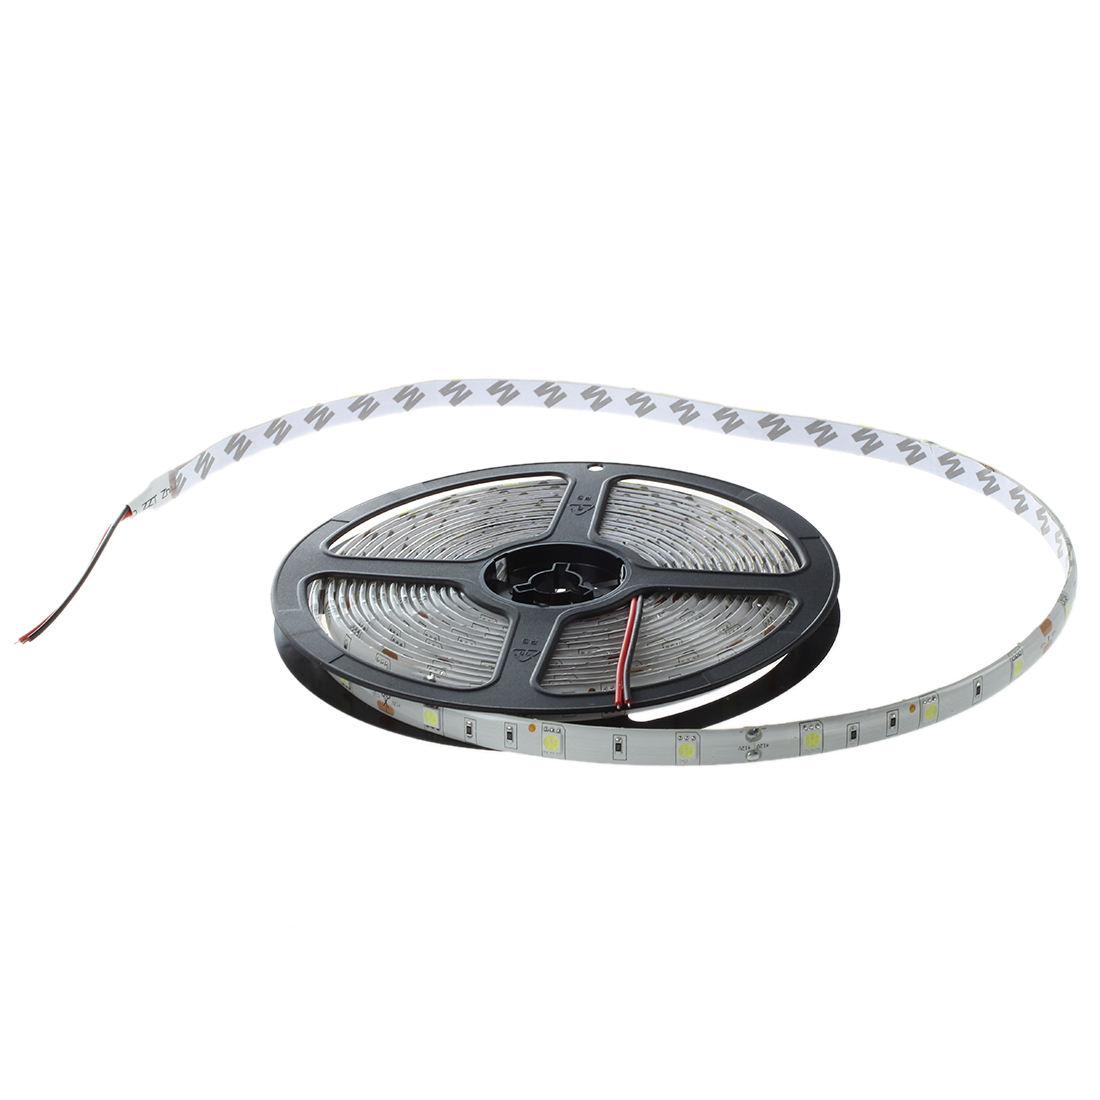 Waterproof 5M LED 150*5050 SMD DC12V warm white 36W IP65 Strip Light U4E6